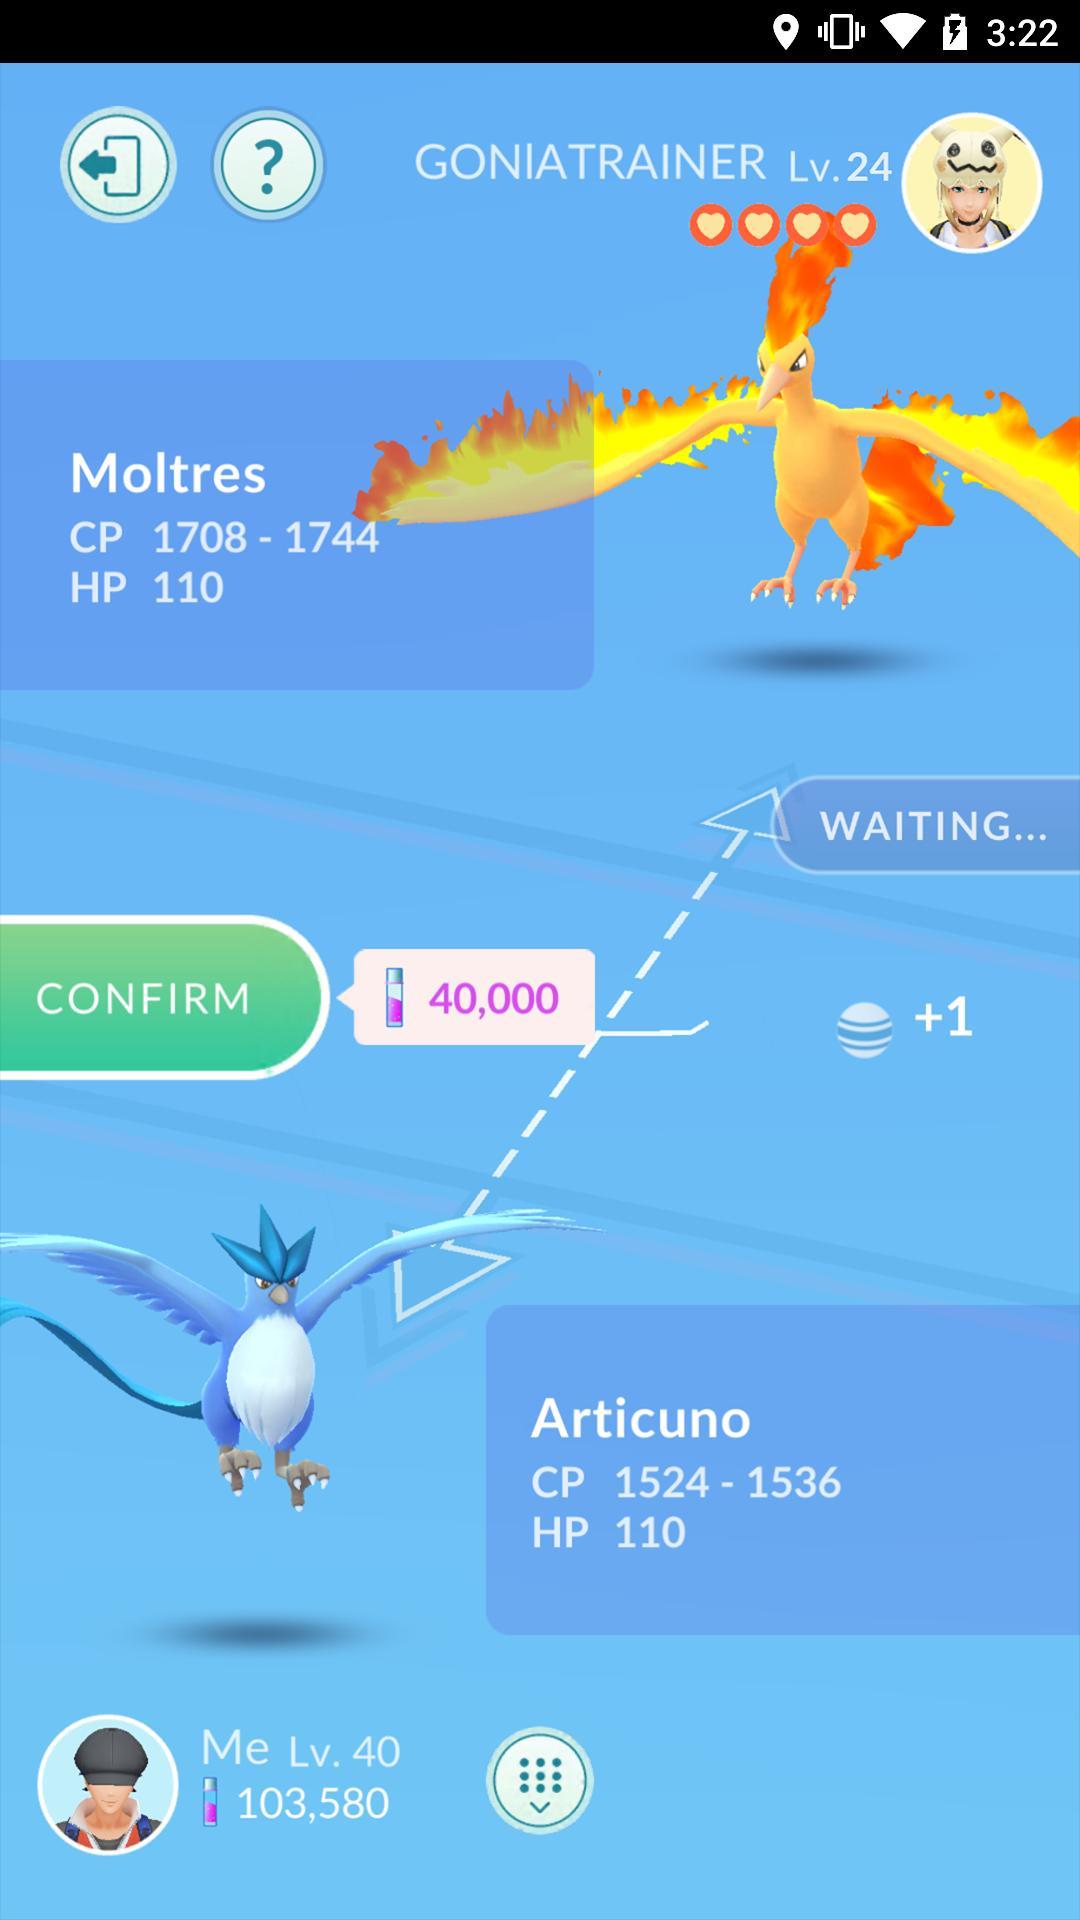 Pokémon GO APK 0 151 0 Download, the best real world adventure game